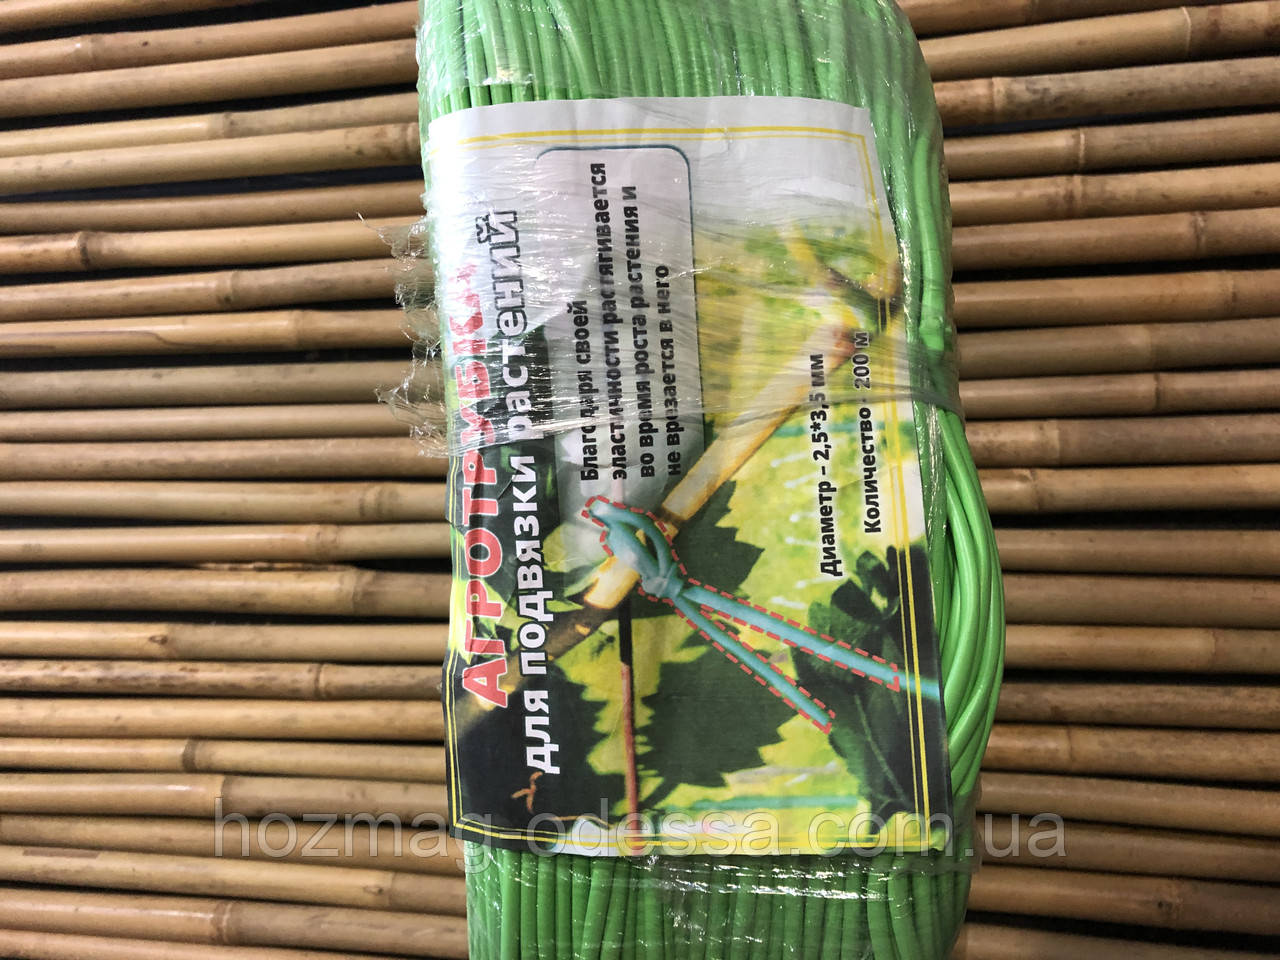 Кембрик (агротрубка ПВХ), подвязка для растений